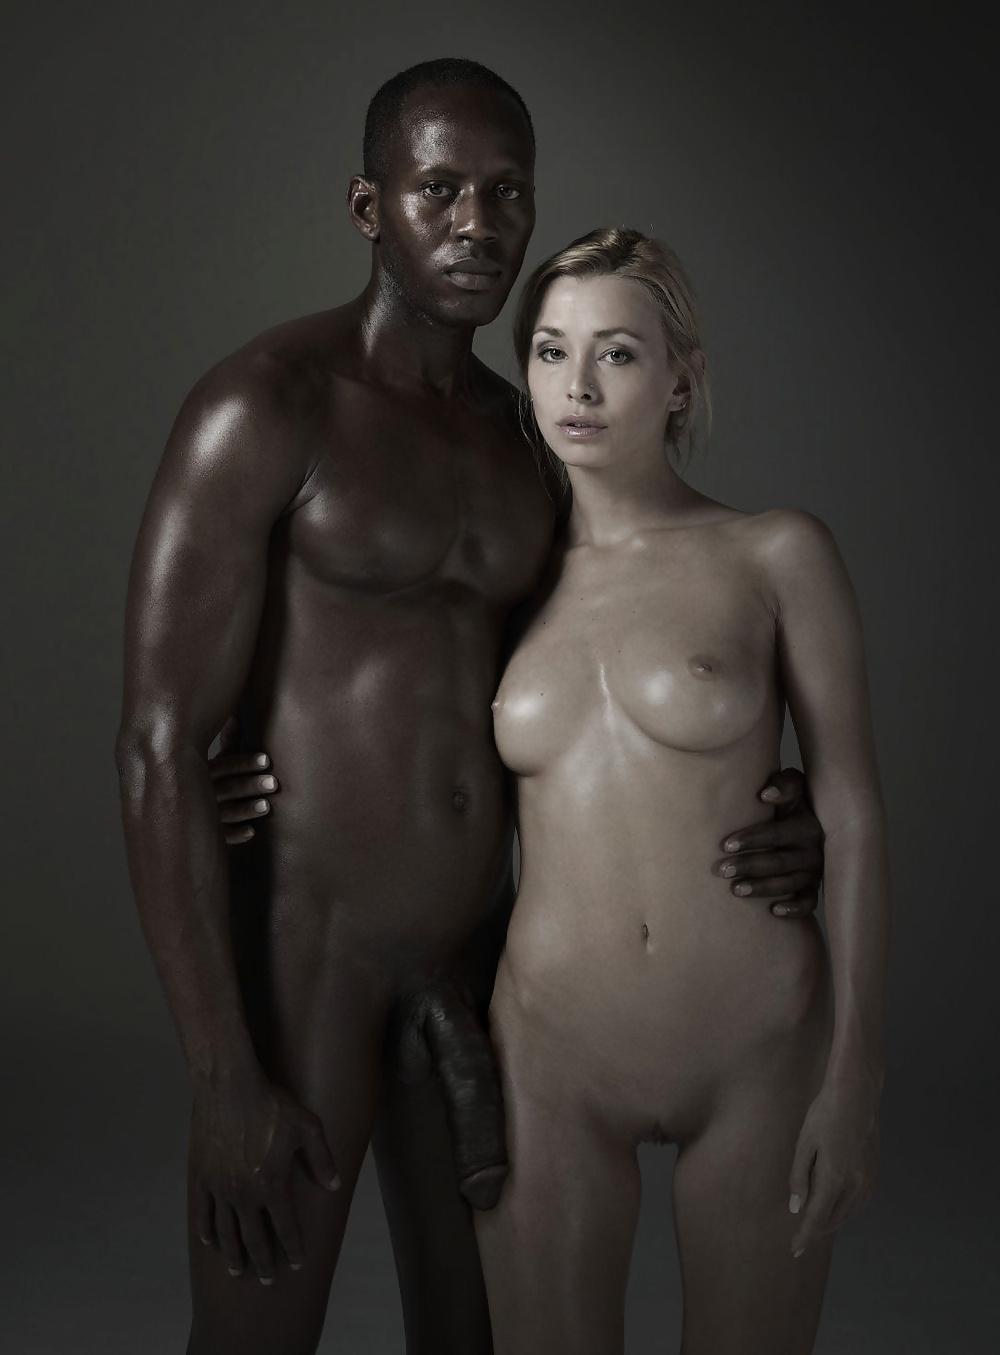 Black man and girl nude scene — photo 7